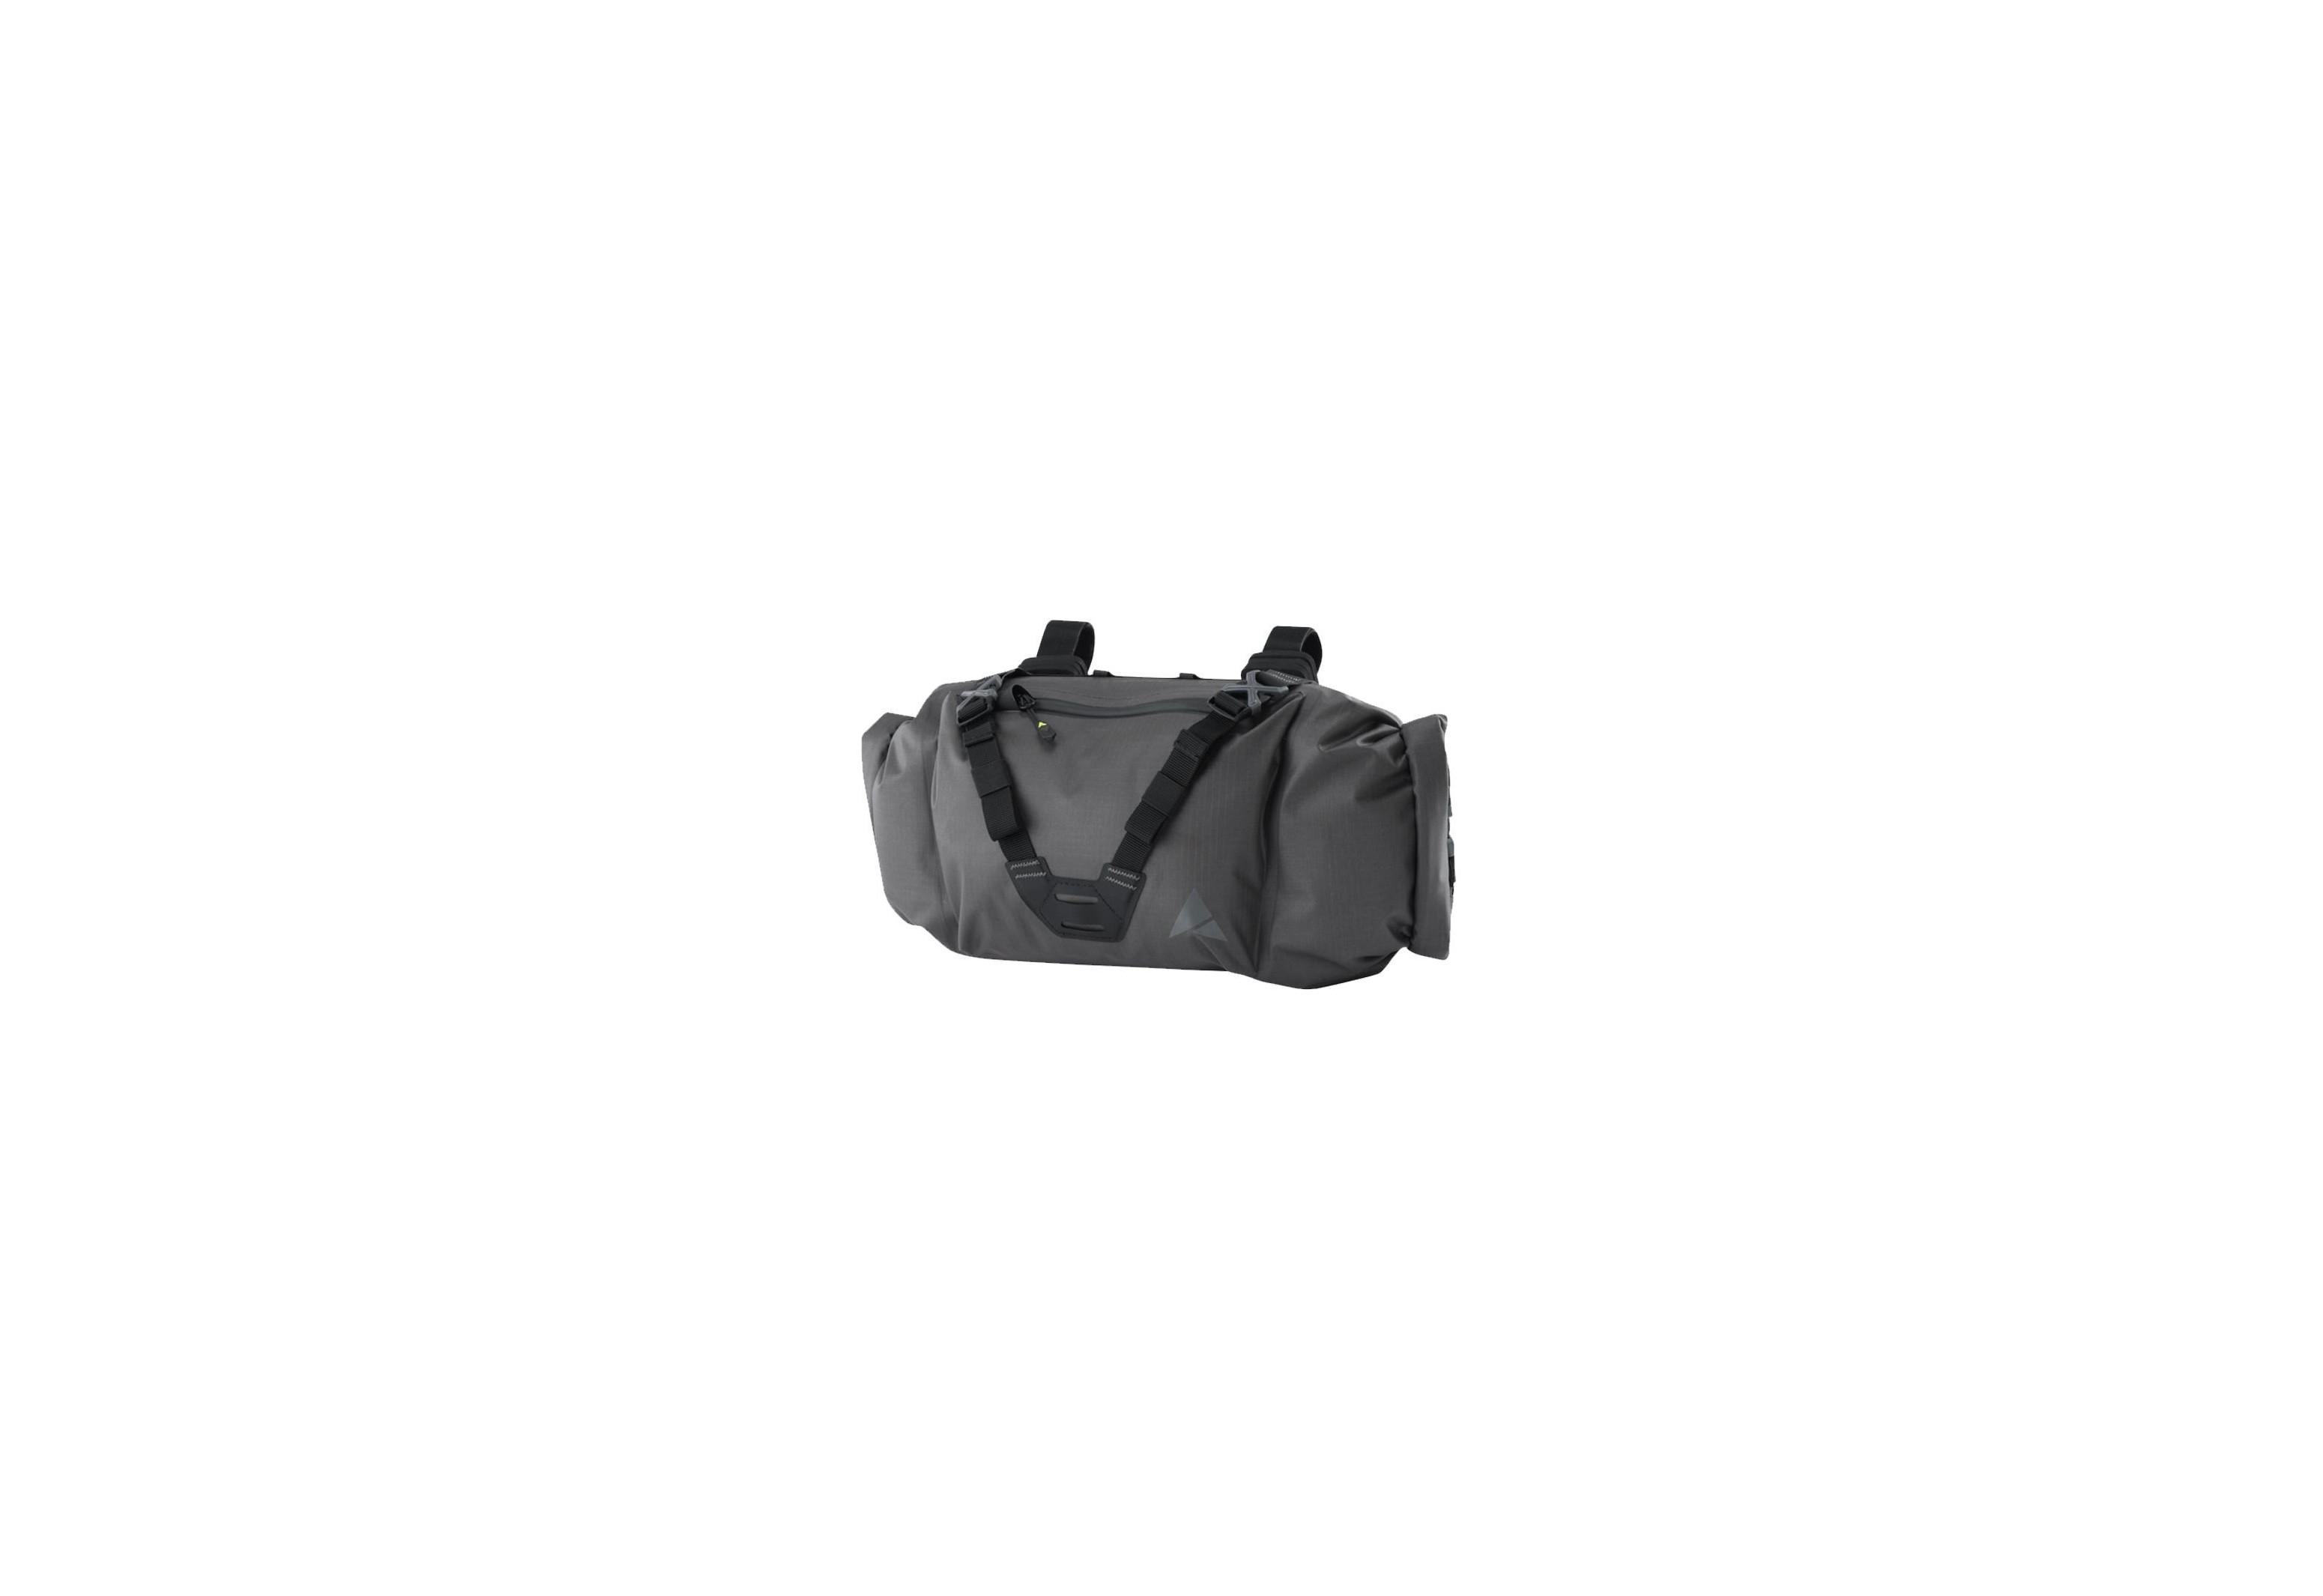 Sacoche de cintre Altura Vortex 2 compact